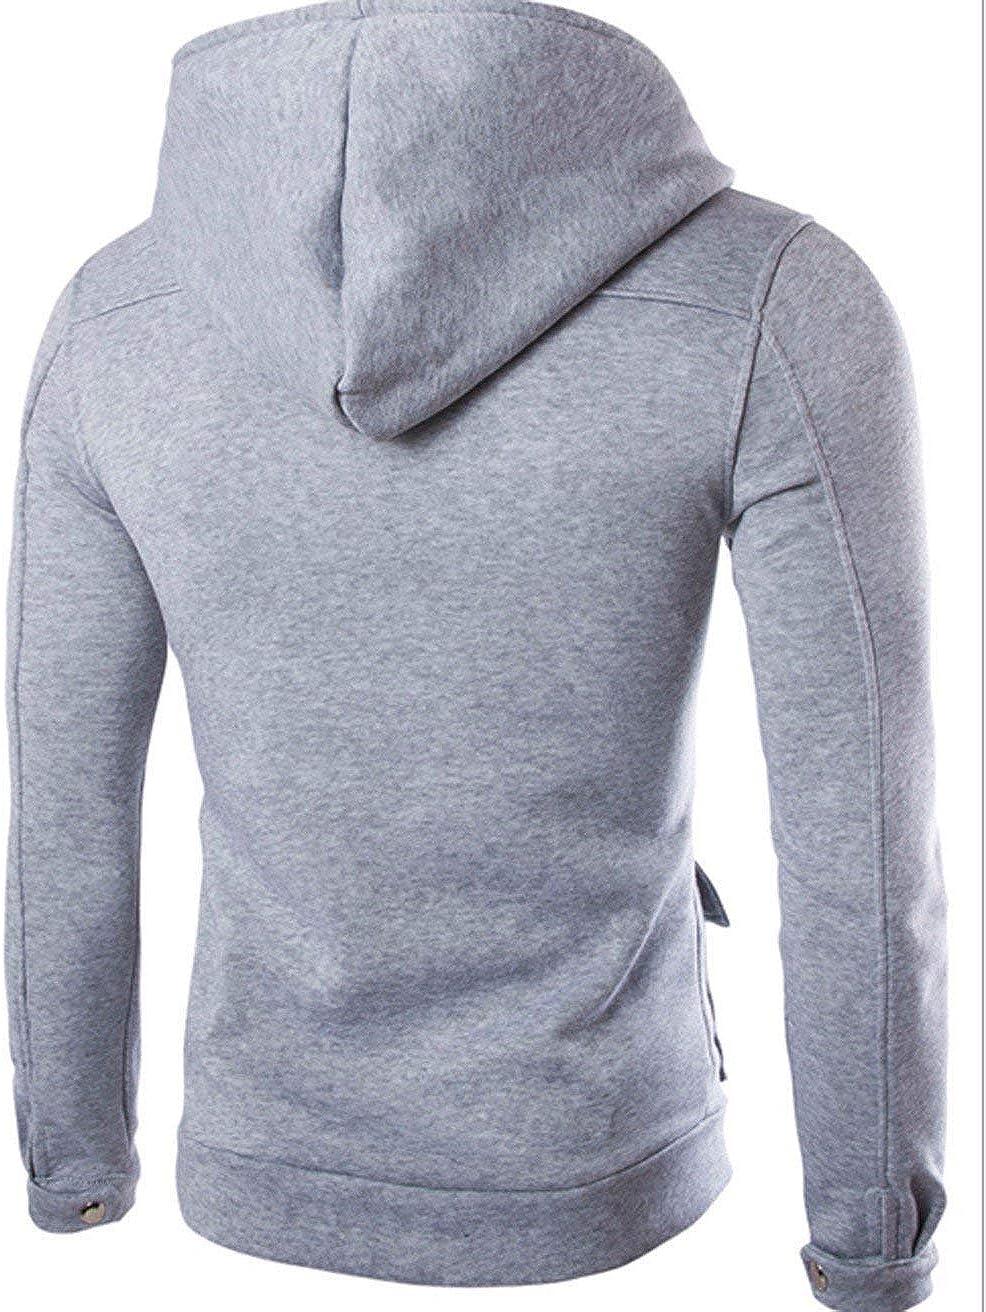 iYBUIA Autumn Winter Men Pocket Pure Coat Jacket Sweater Swearshirt Hoodie Long Sleeve Outwear